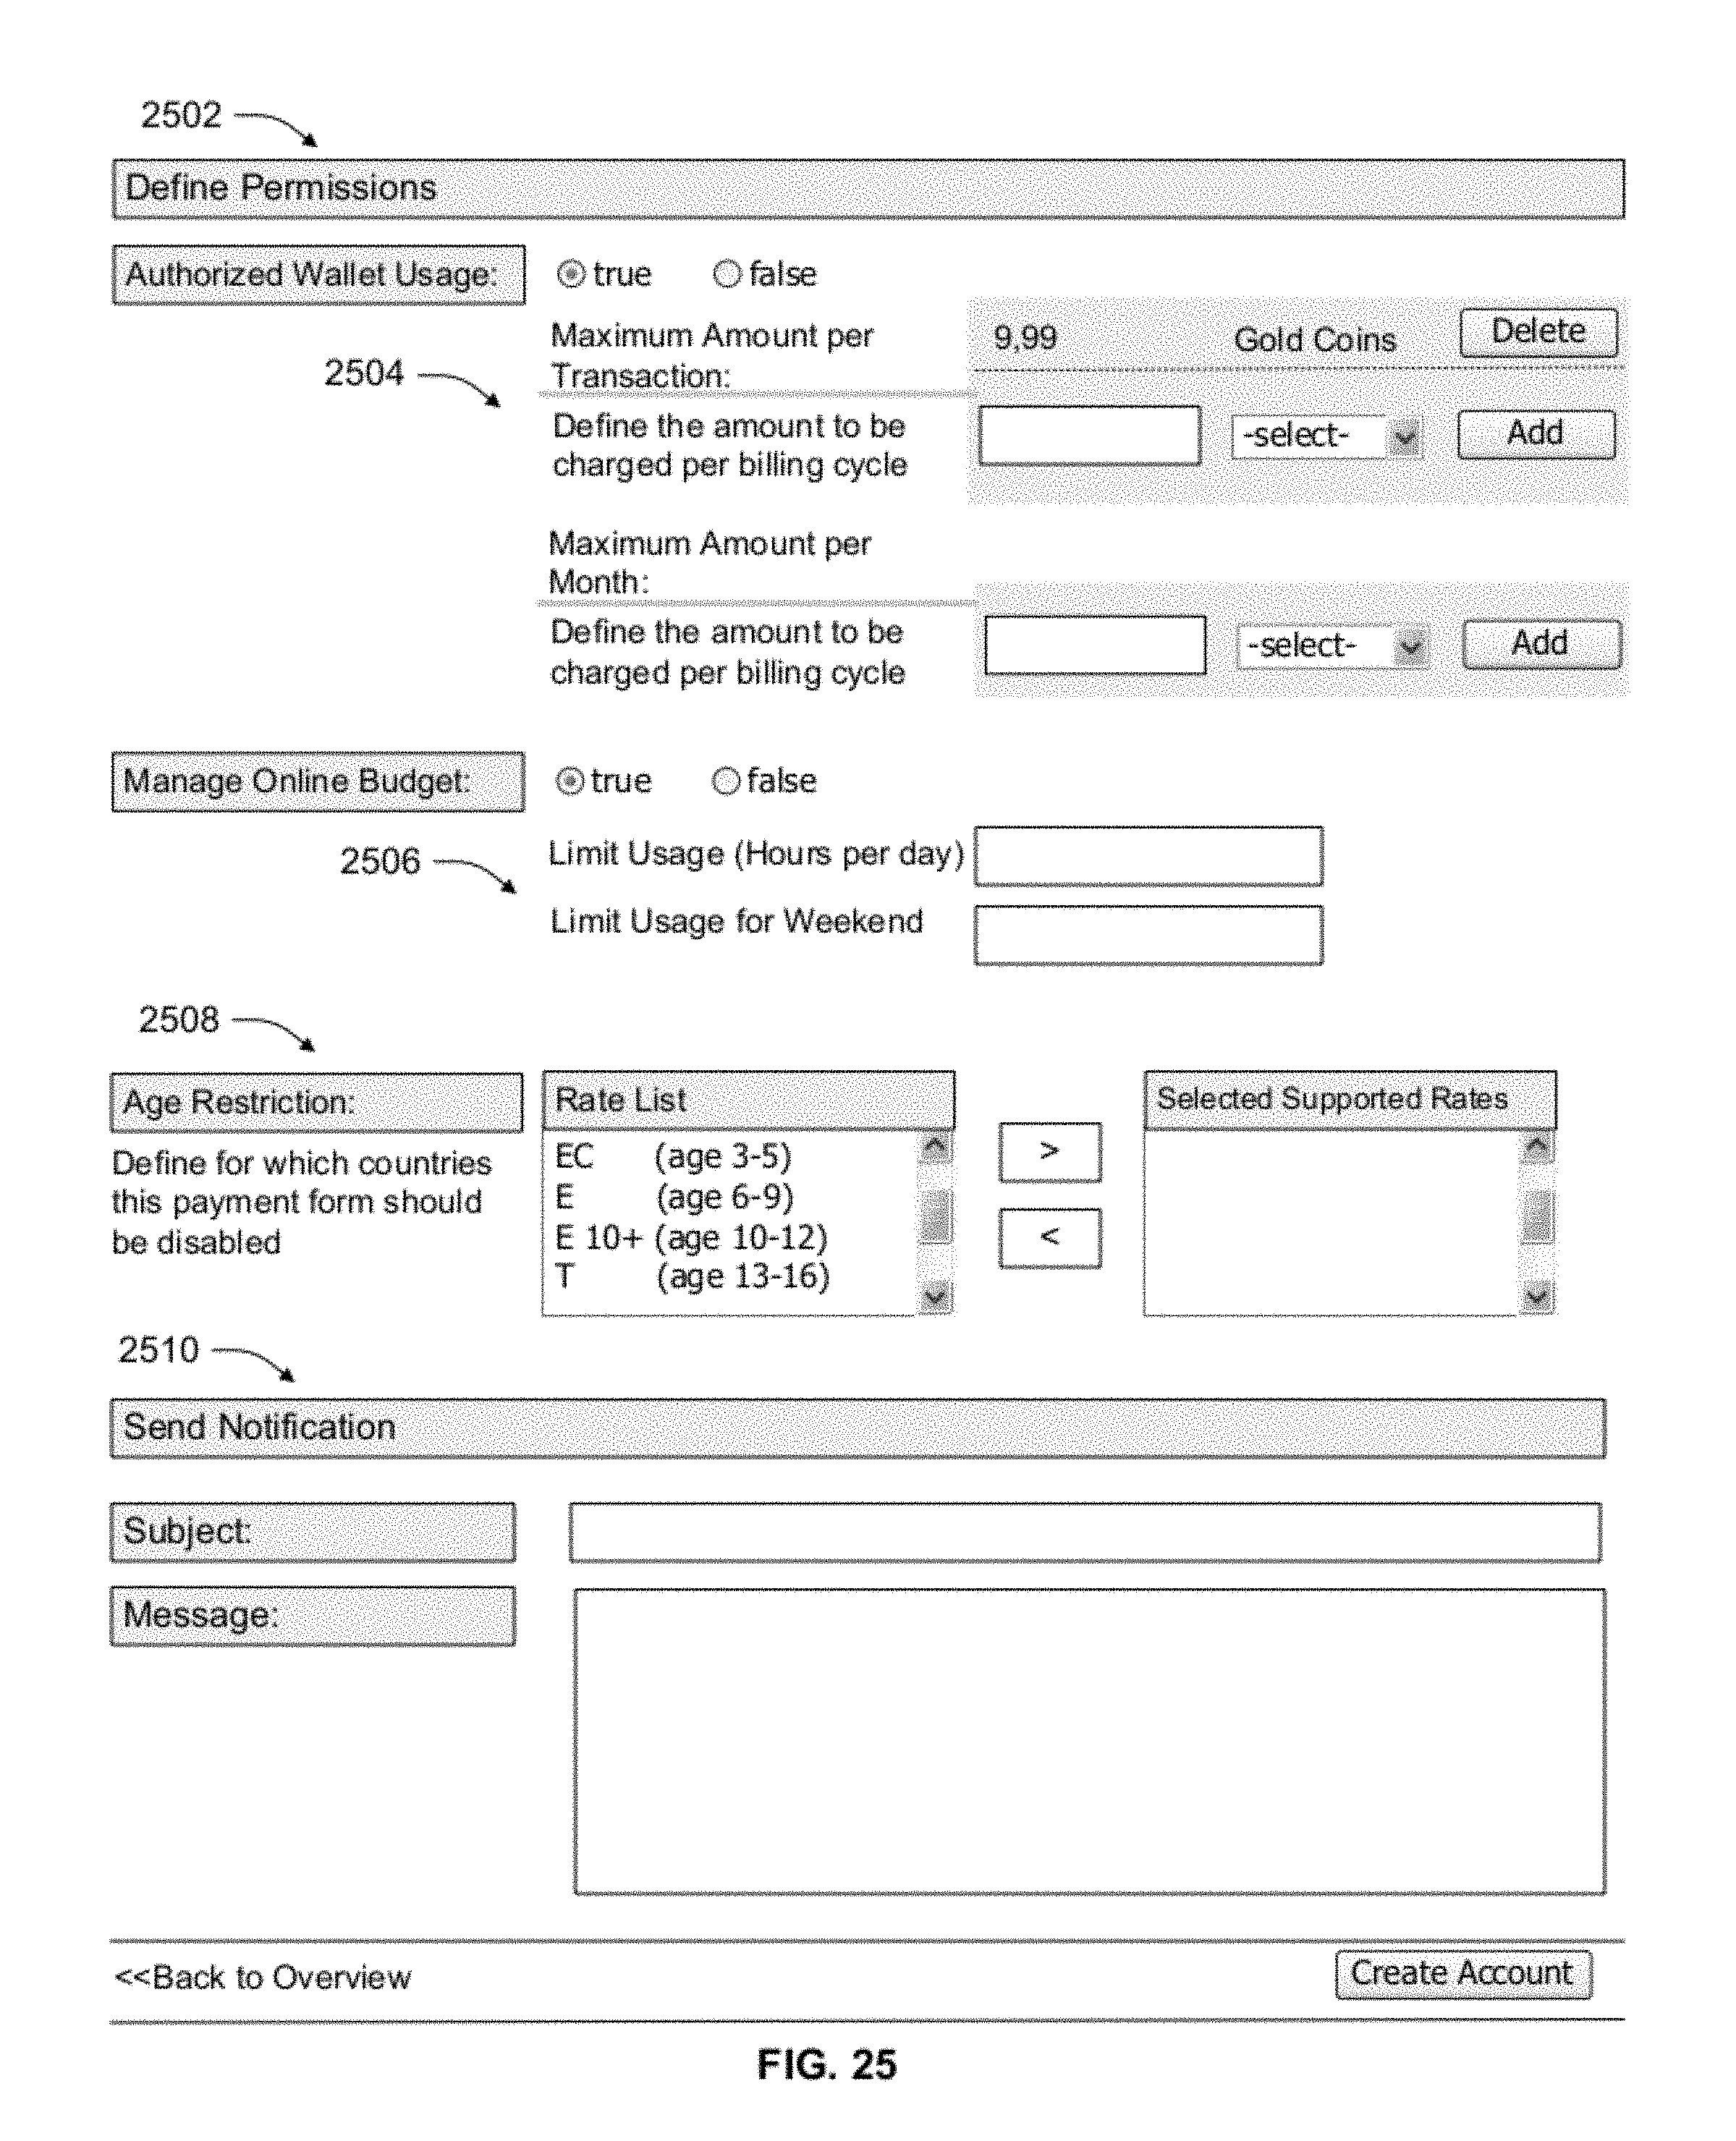 Patent US 9,785,988 B2